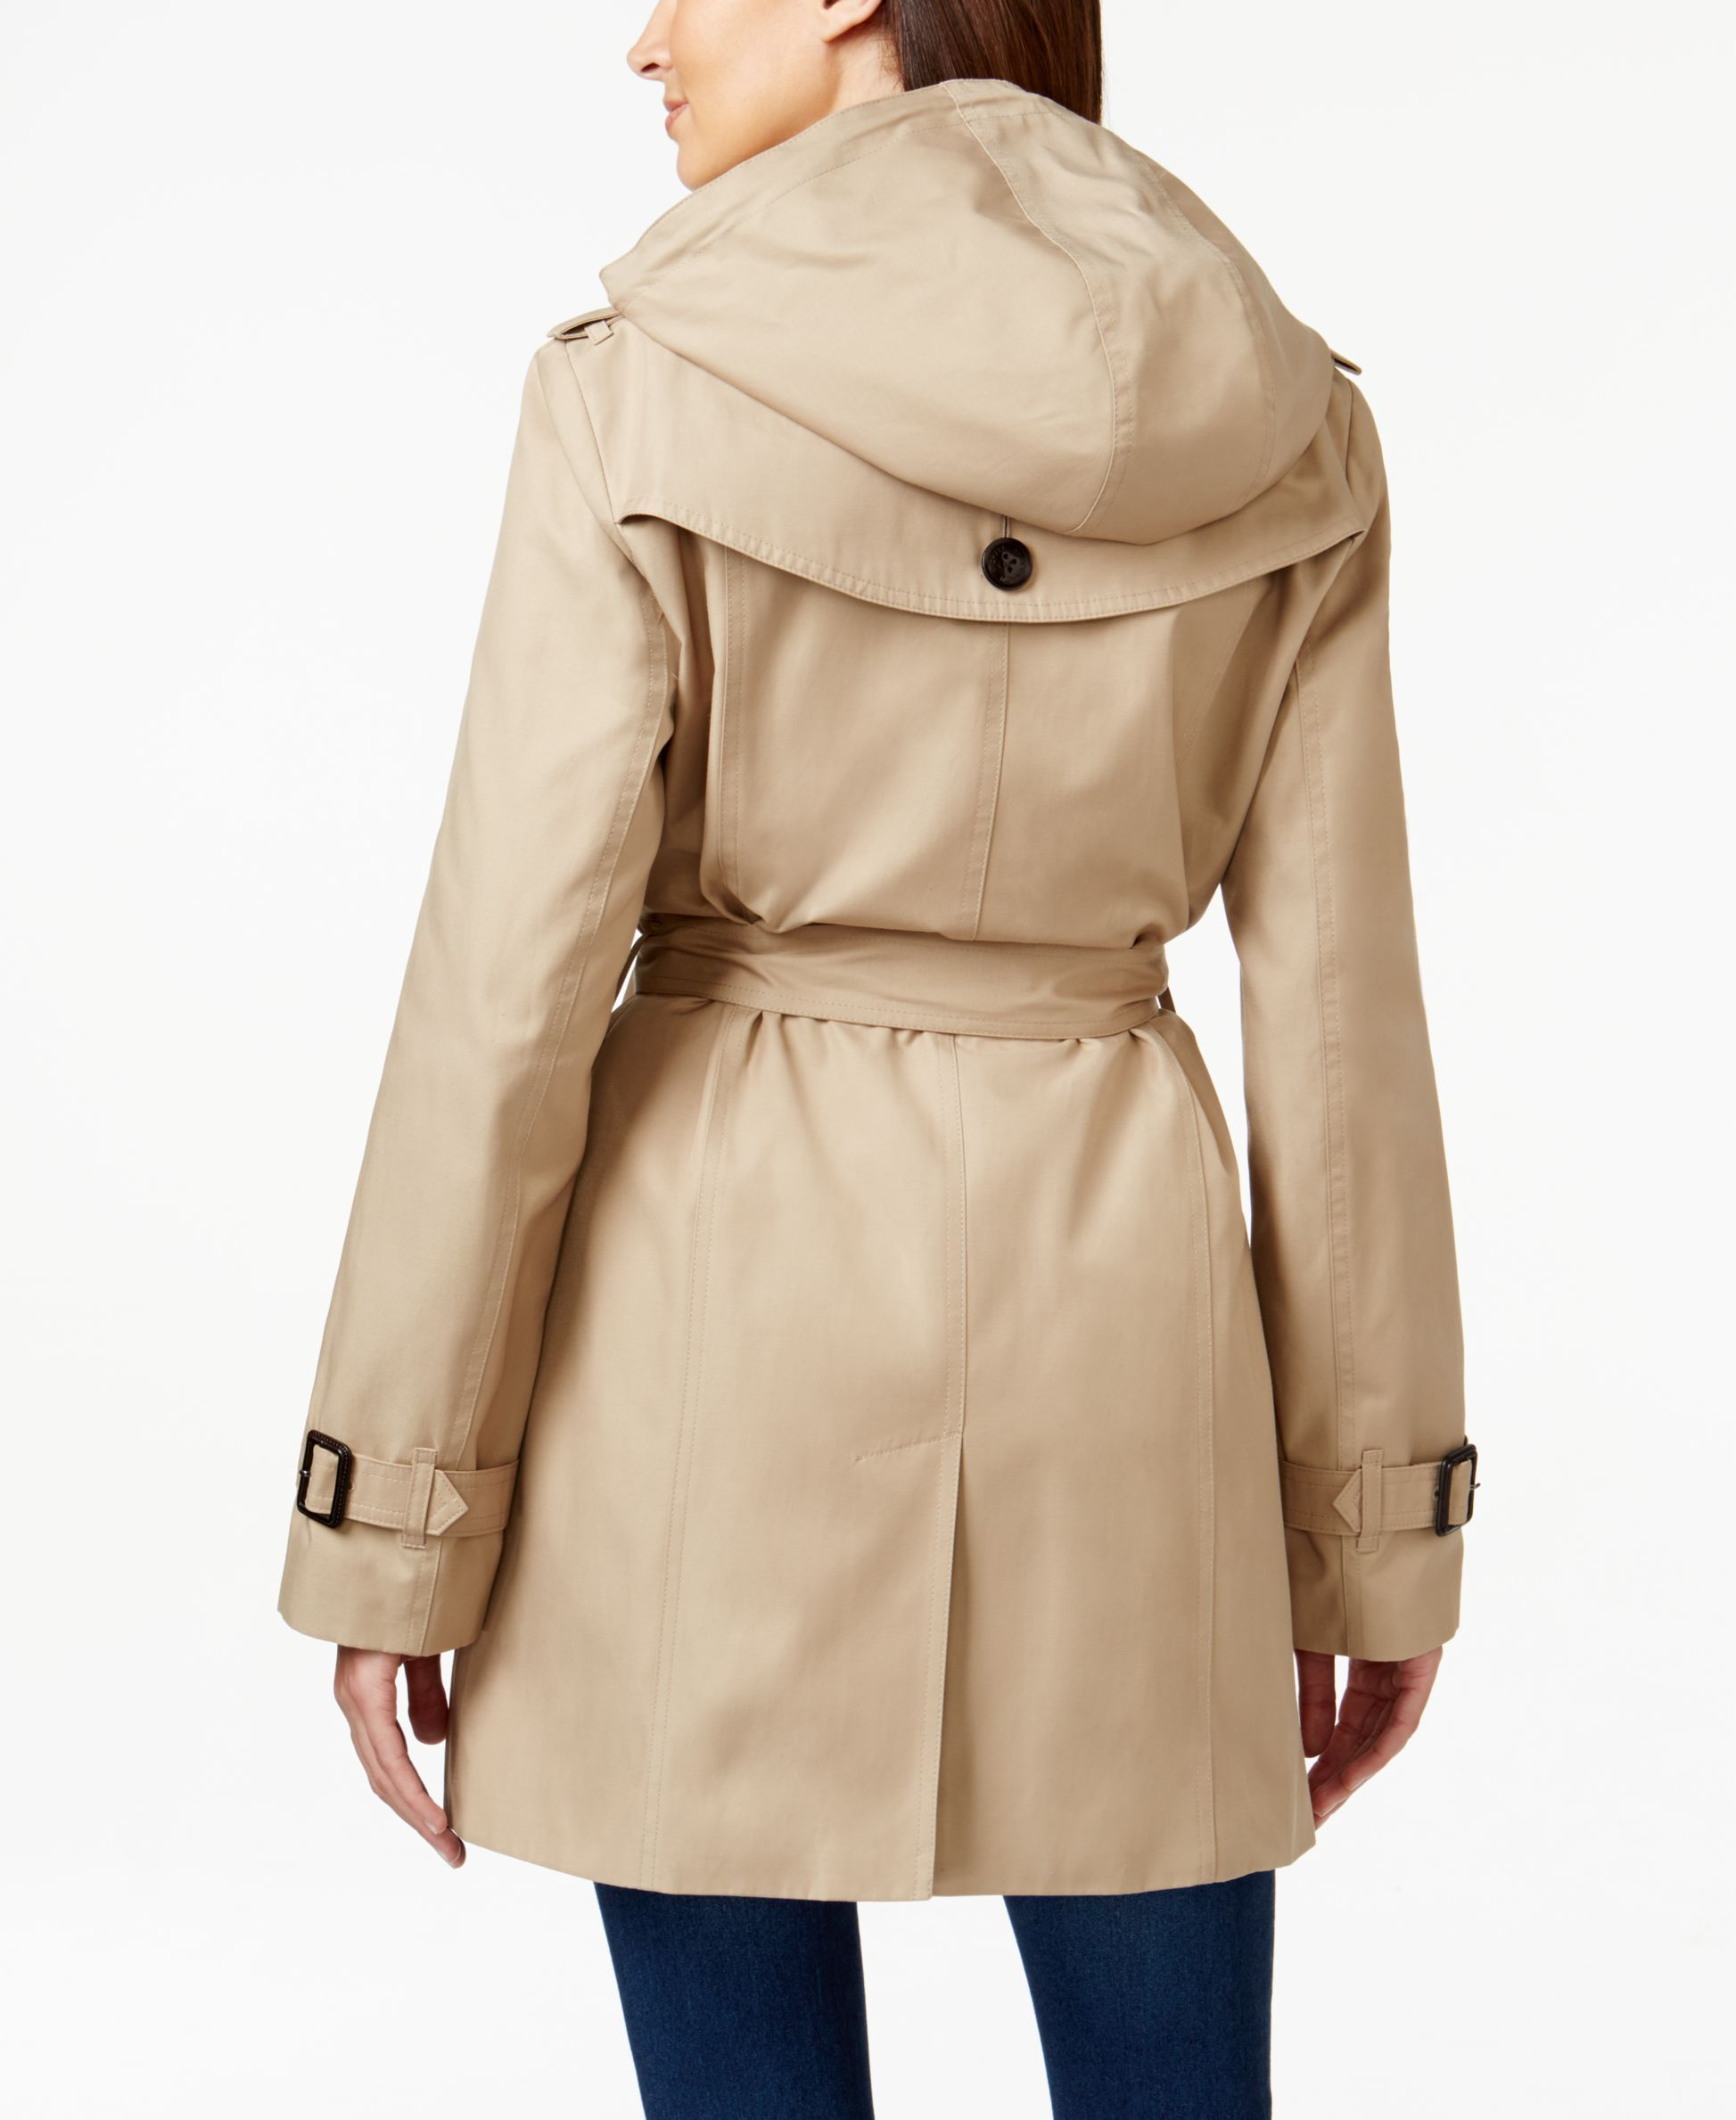 Michael Michael Kors Hooded Double Breasted Trench Coat Michael Kors Coats Jackets Women Macy S Trench Coat Coats Jackets Women Michael Kors Coats [ 2378 x 1947 Pixel ]